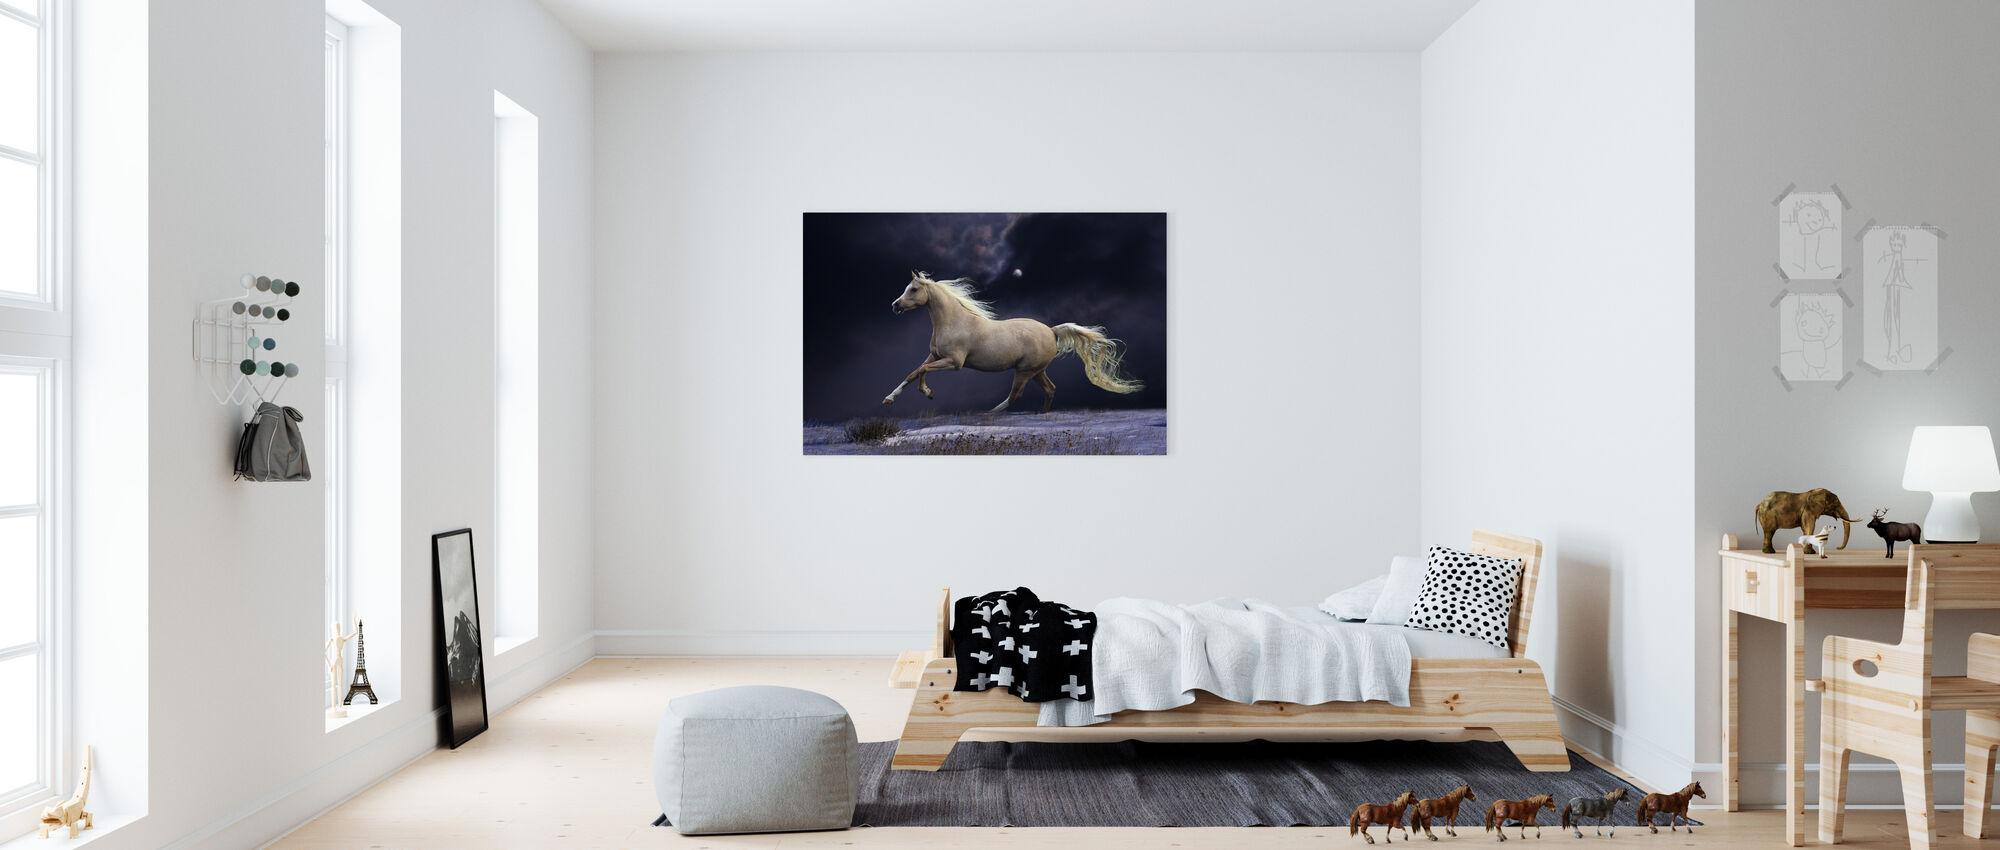 Horse in Moonlight - Canvas print - Kids Room